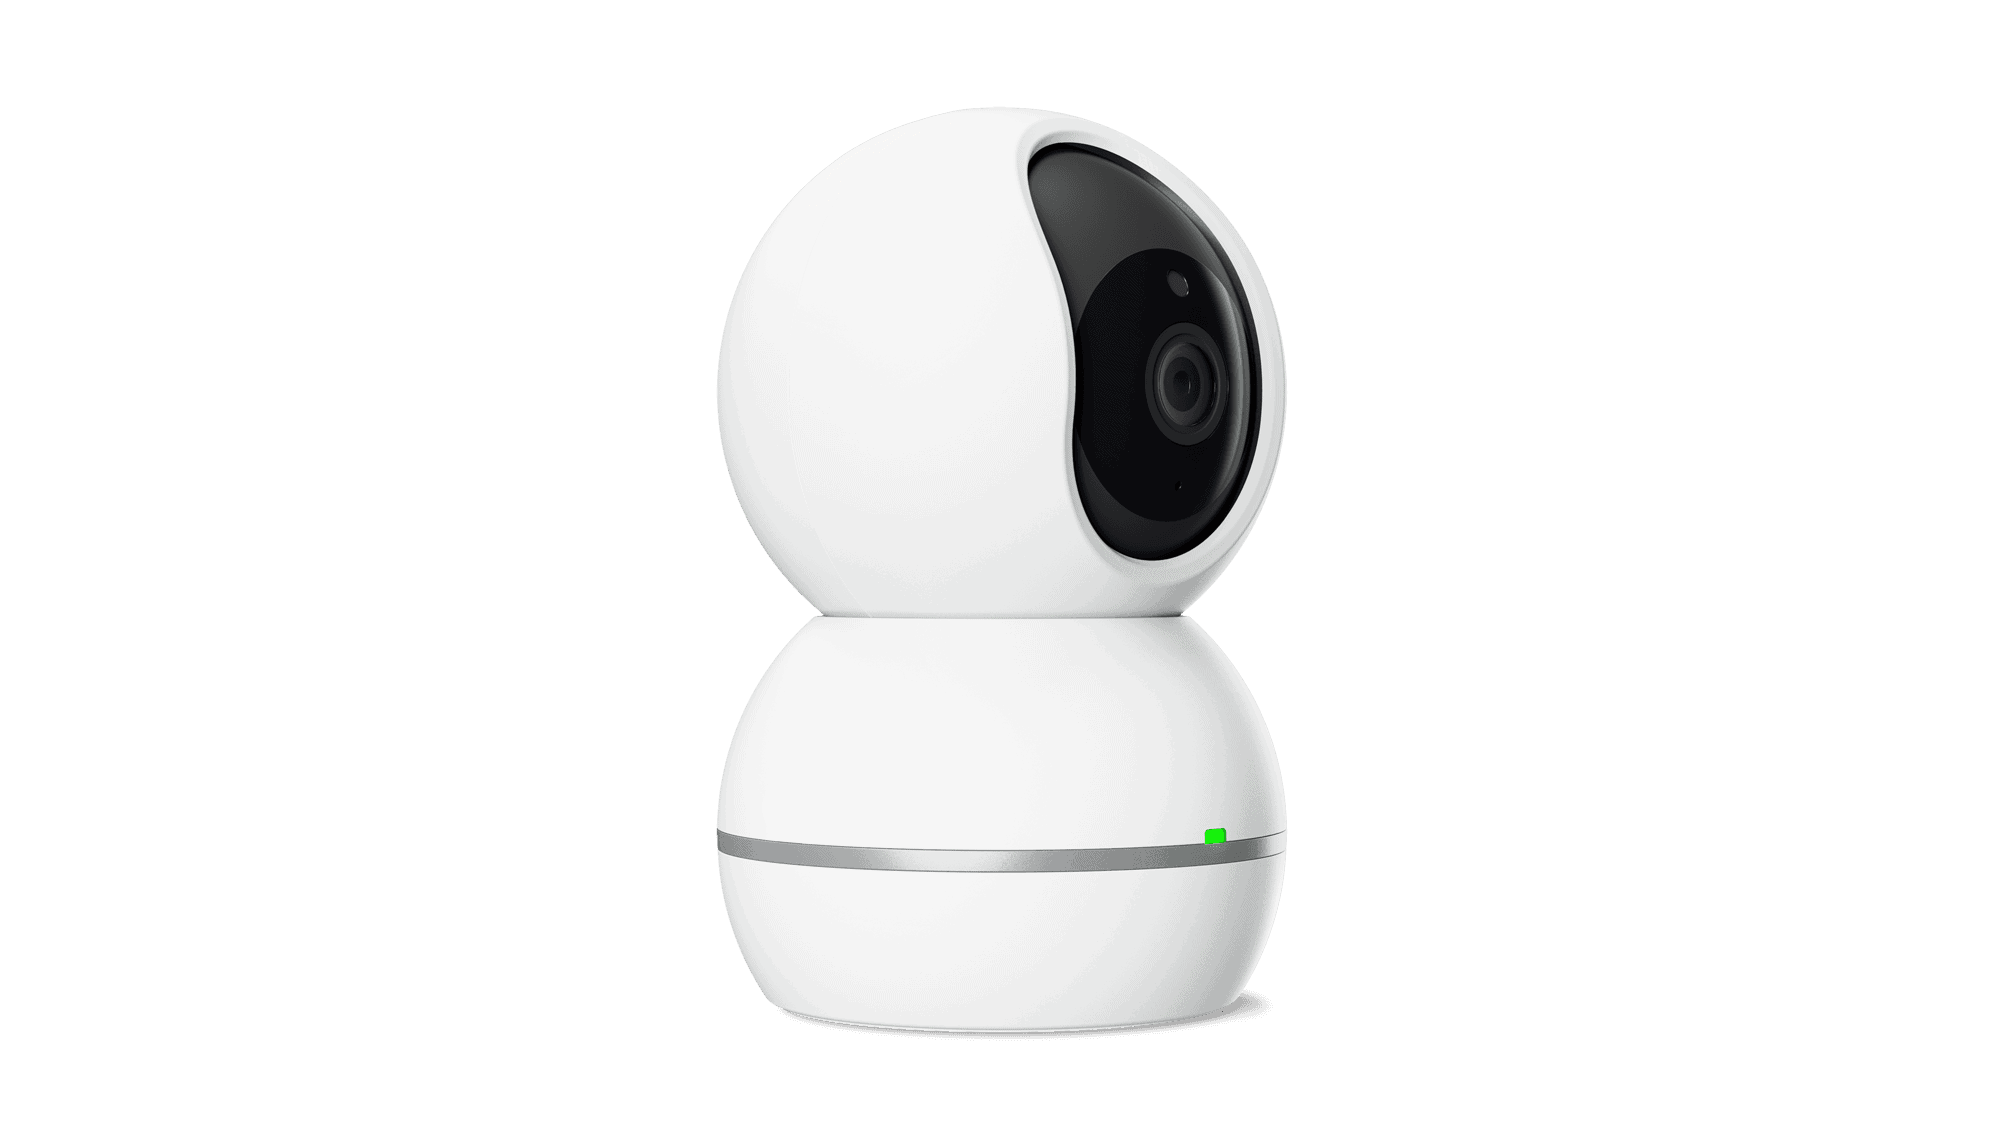 01 Smart Camera Front Facing Right